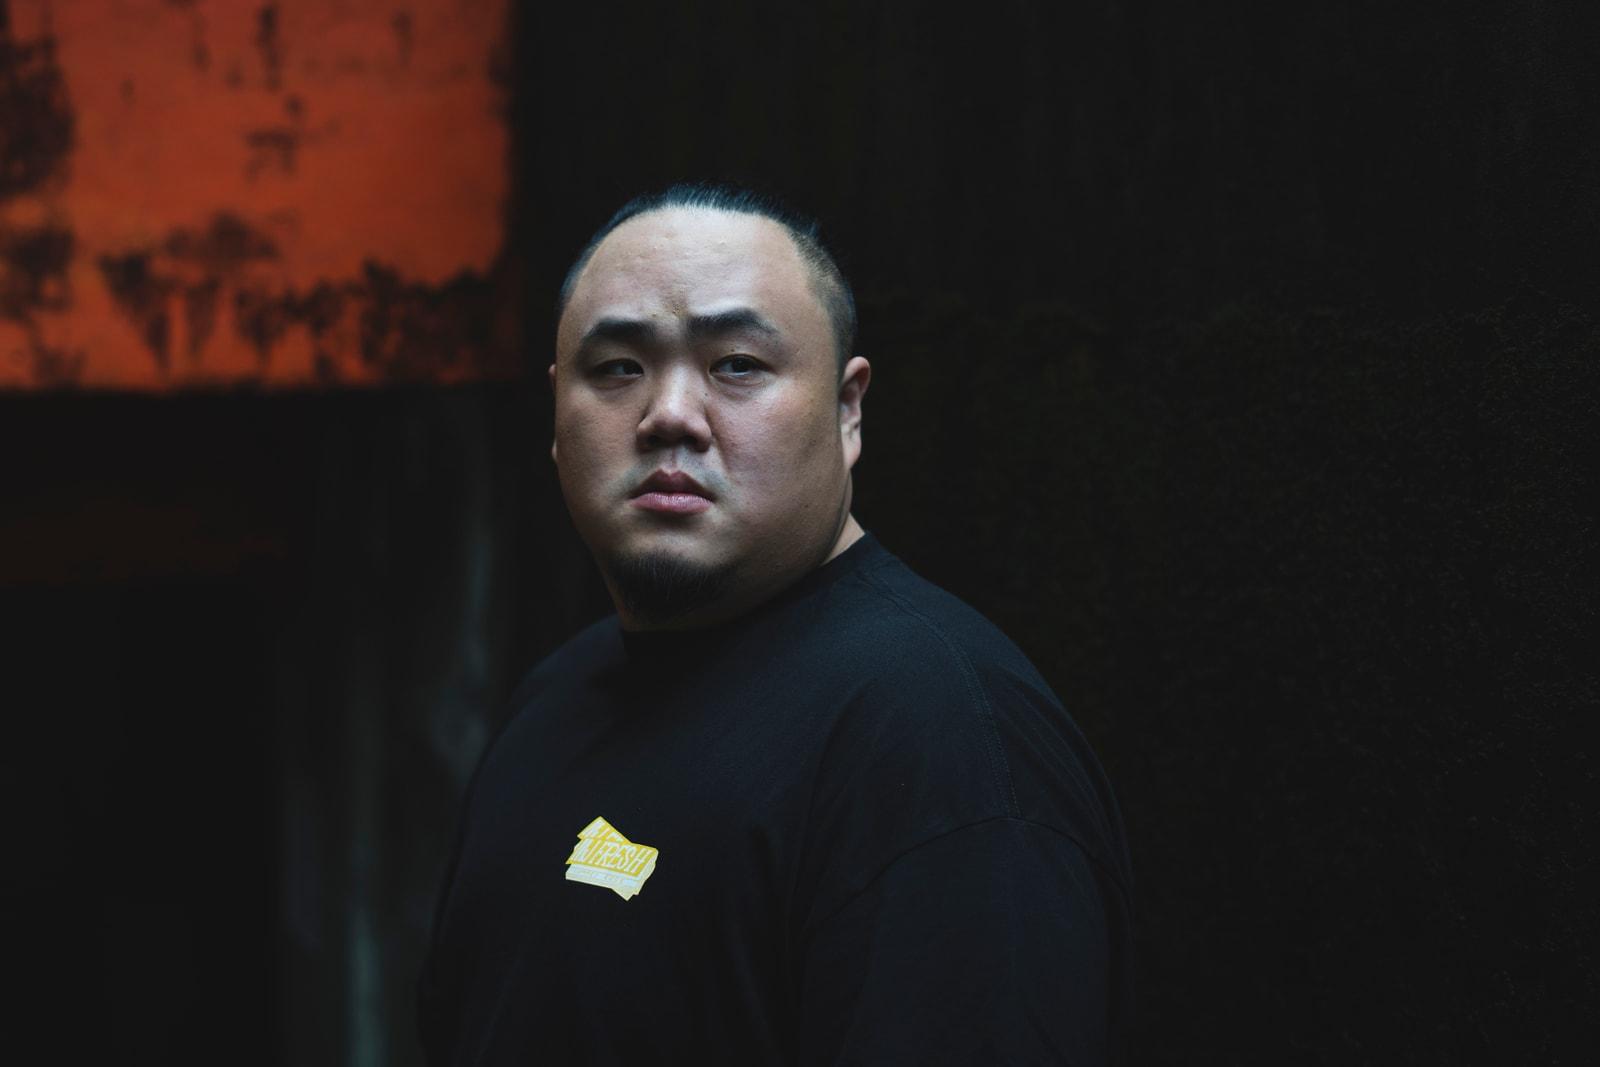 HYPEBEAST 專訪頑童 MJ116 談論華語嘻哈和音樂經營